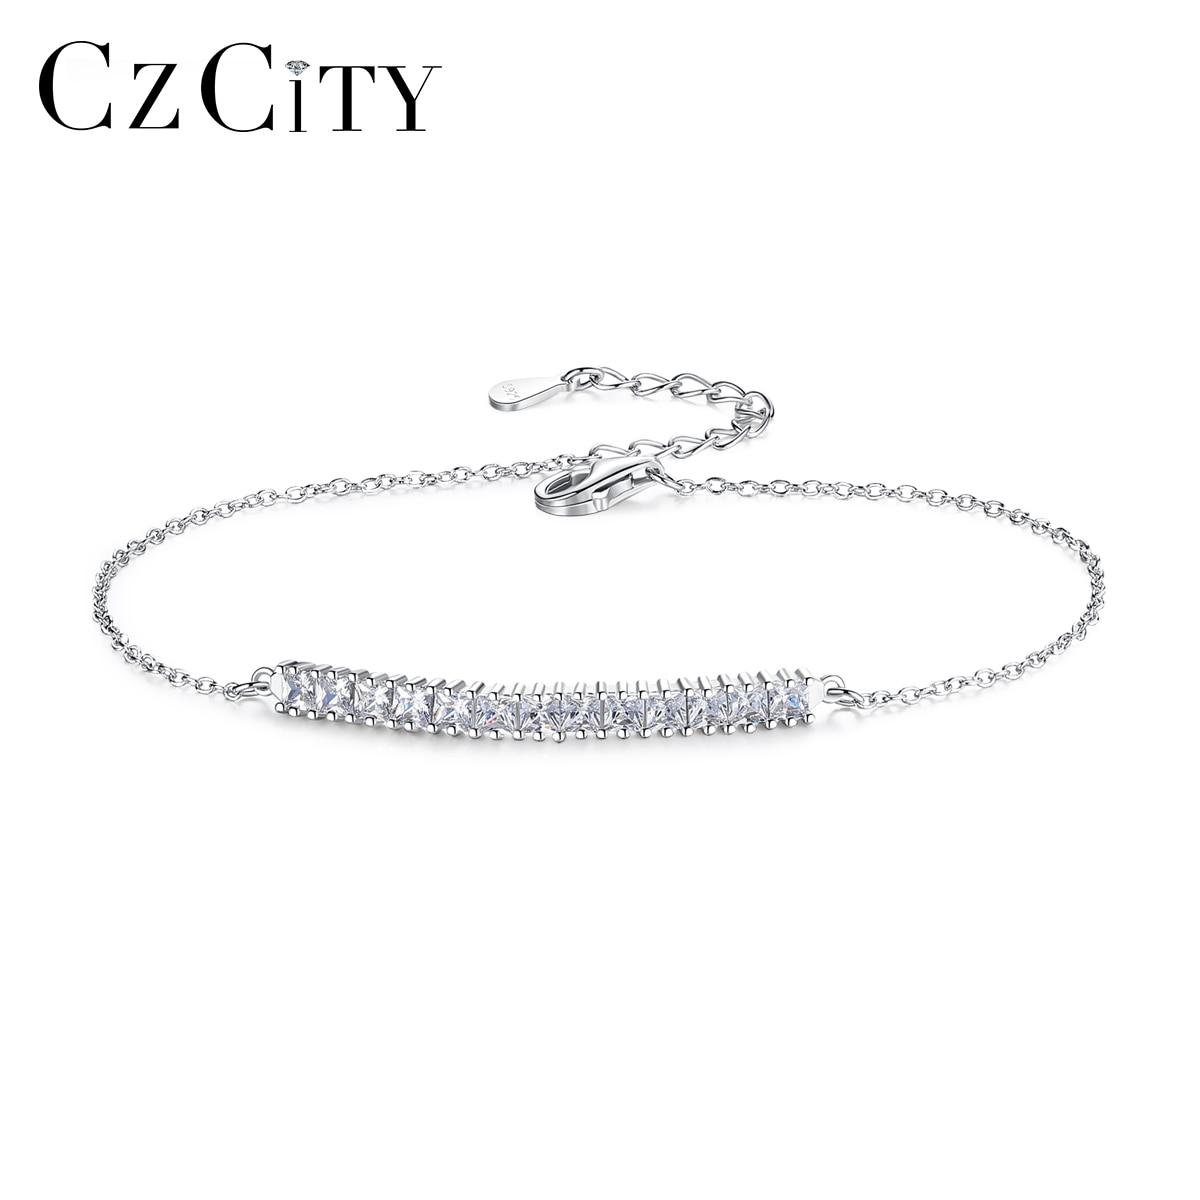 CZCITY Brand Minimalism Bracelet For Women Party Delicate 925 Sterling Silver With Shiny CZ Thin Chain Fine Jewelry SB0055